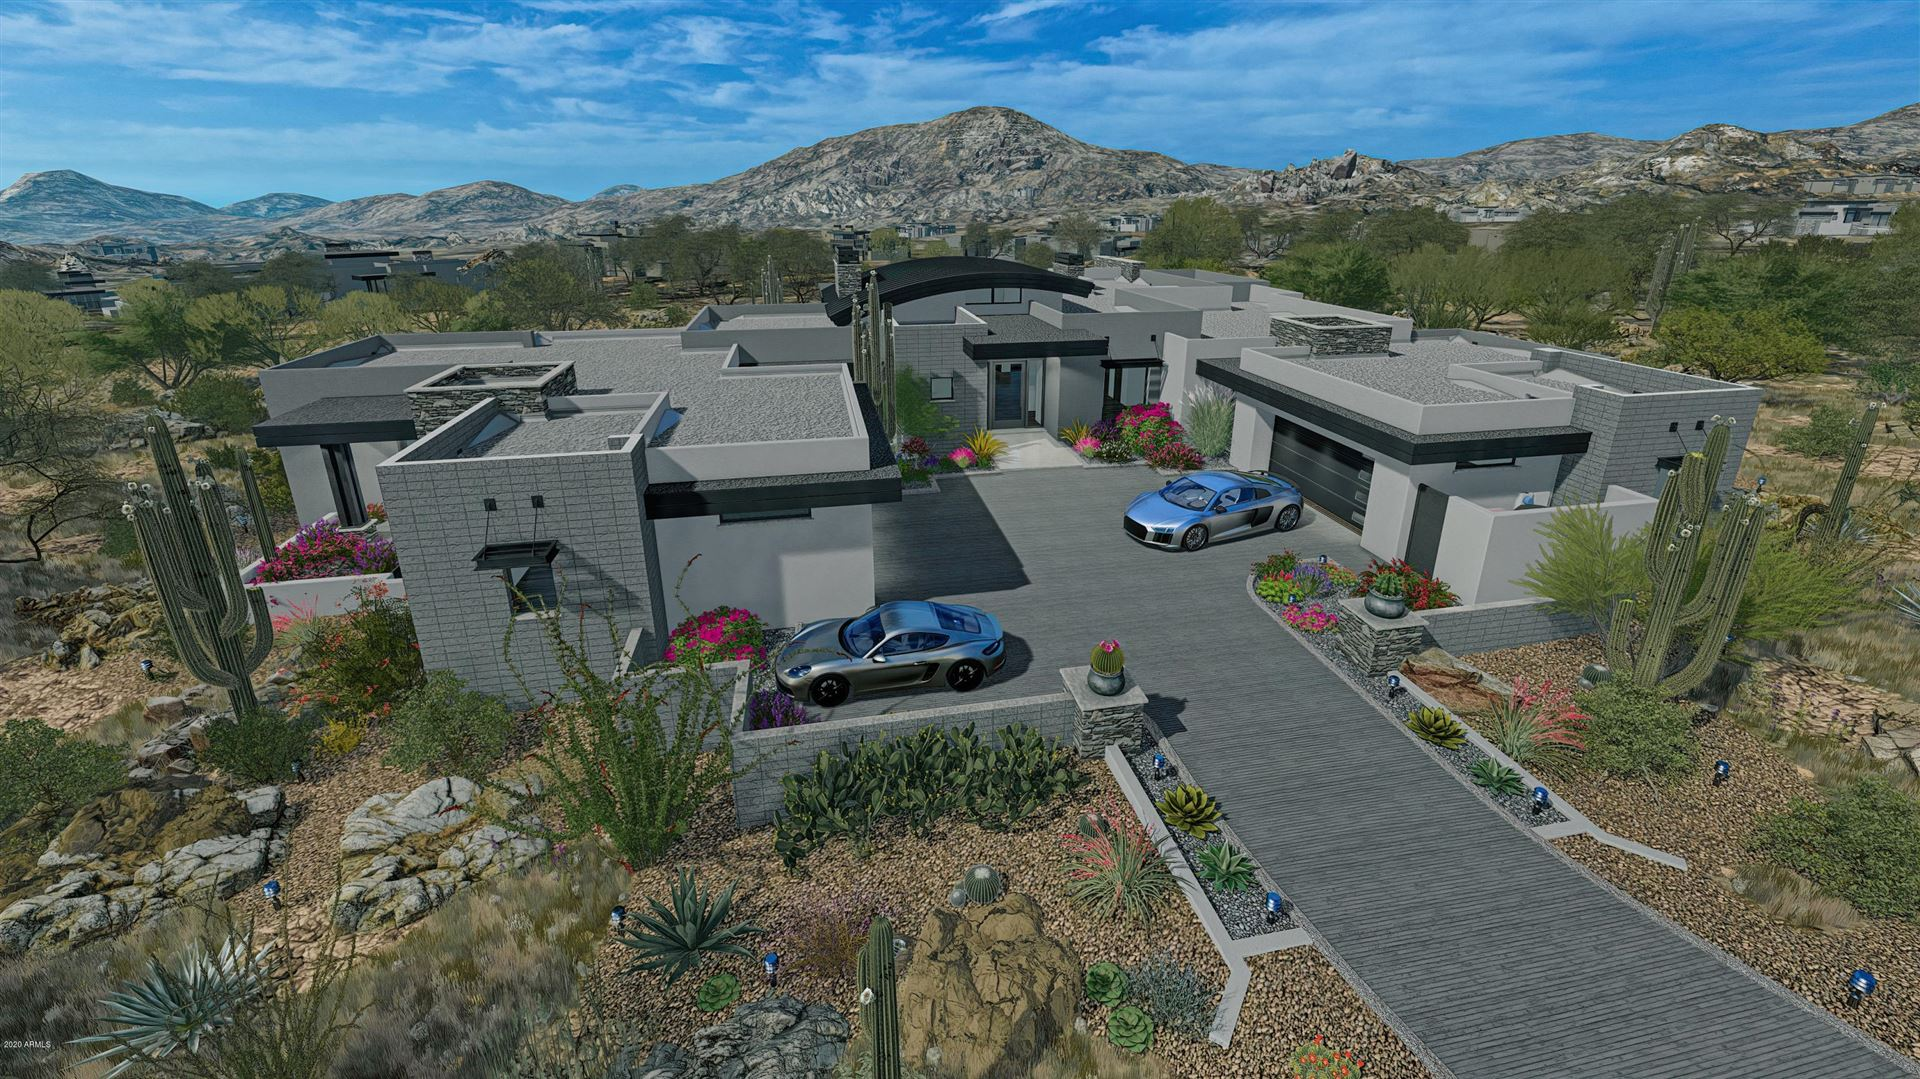 37950 N 99TH Way #292, Scottsdale, AZ 85262 - MLS#: 6159976